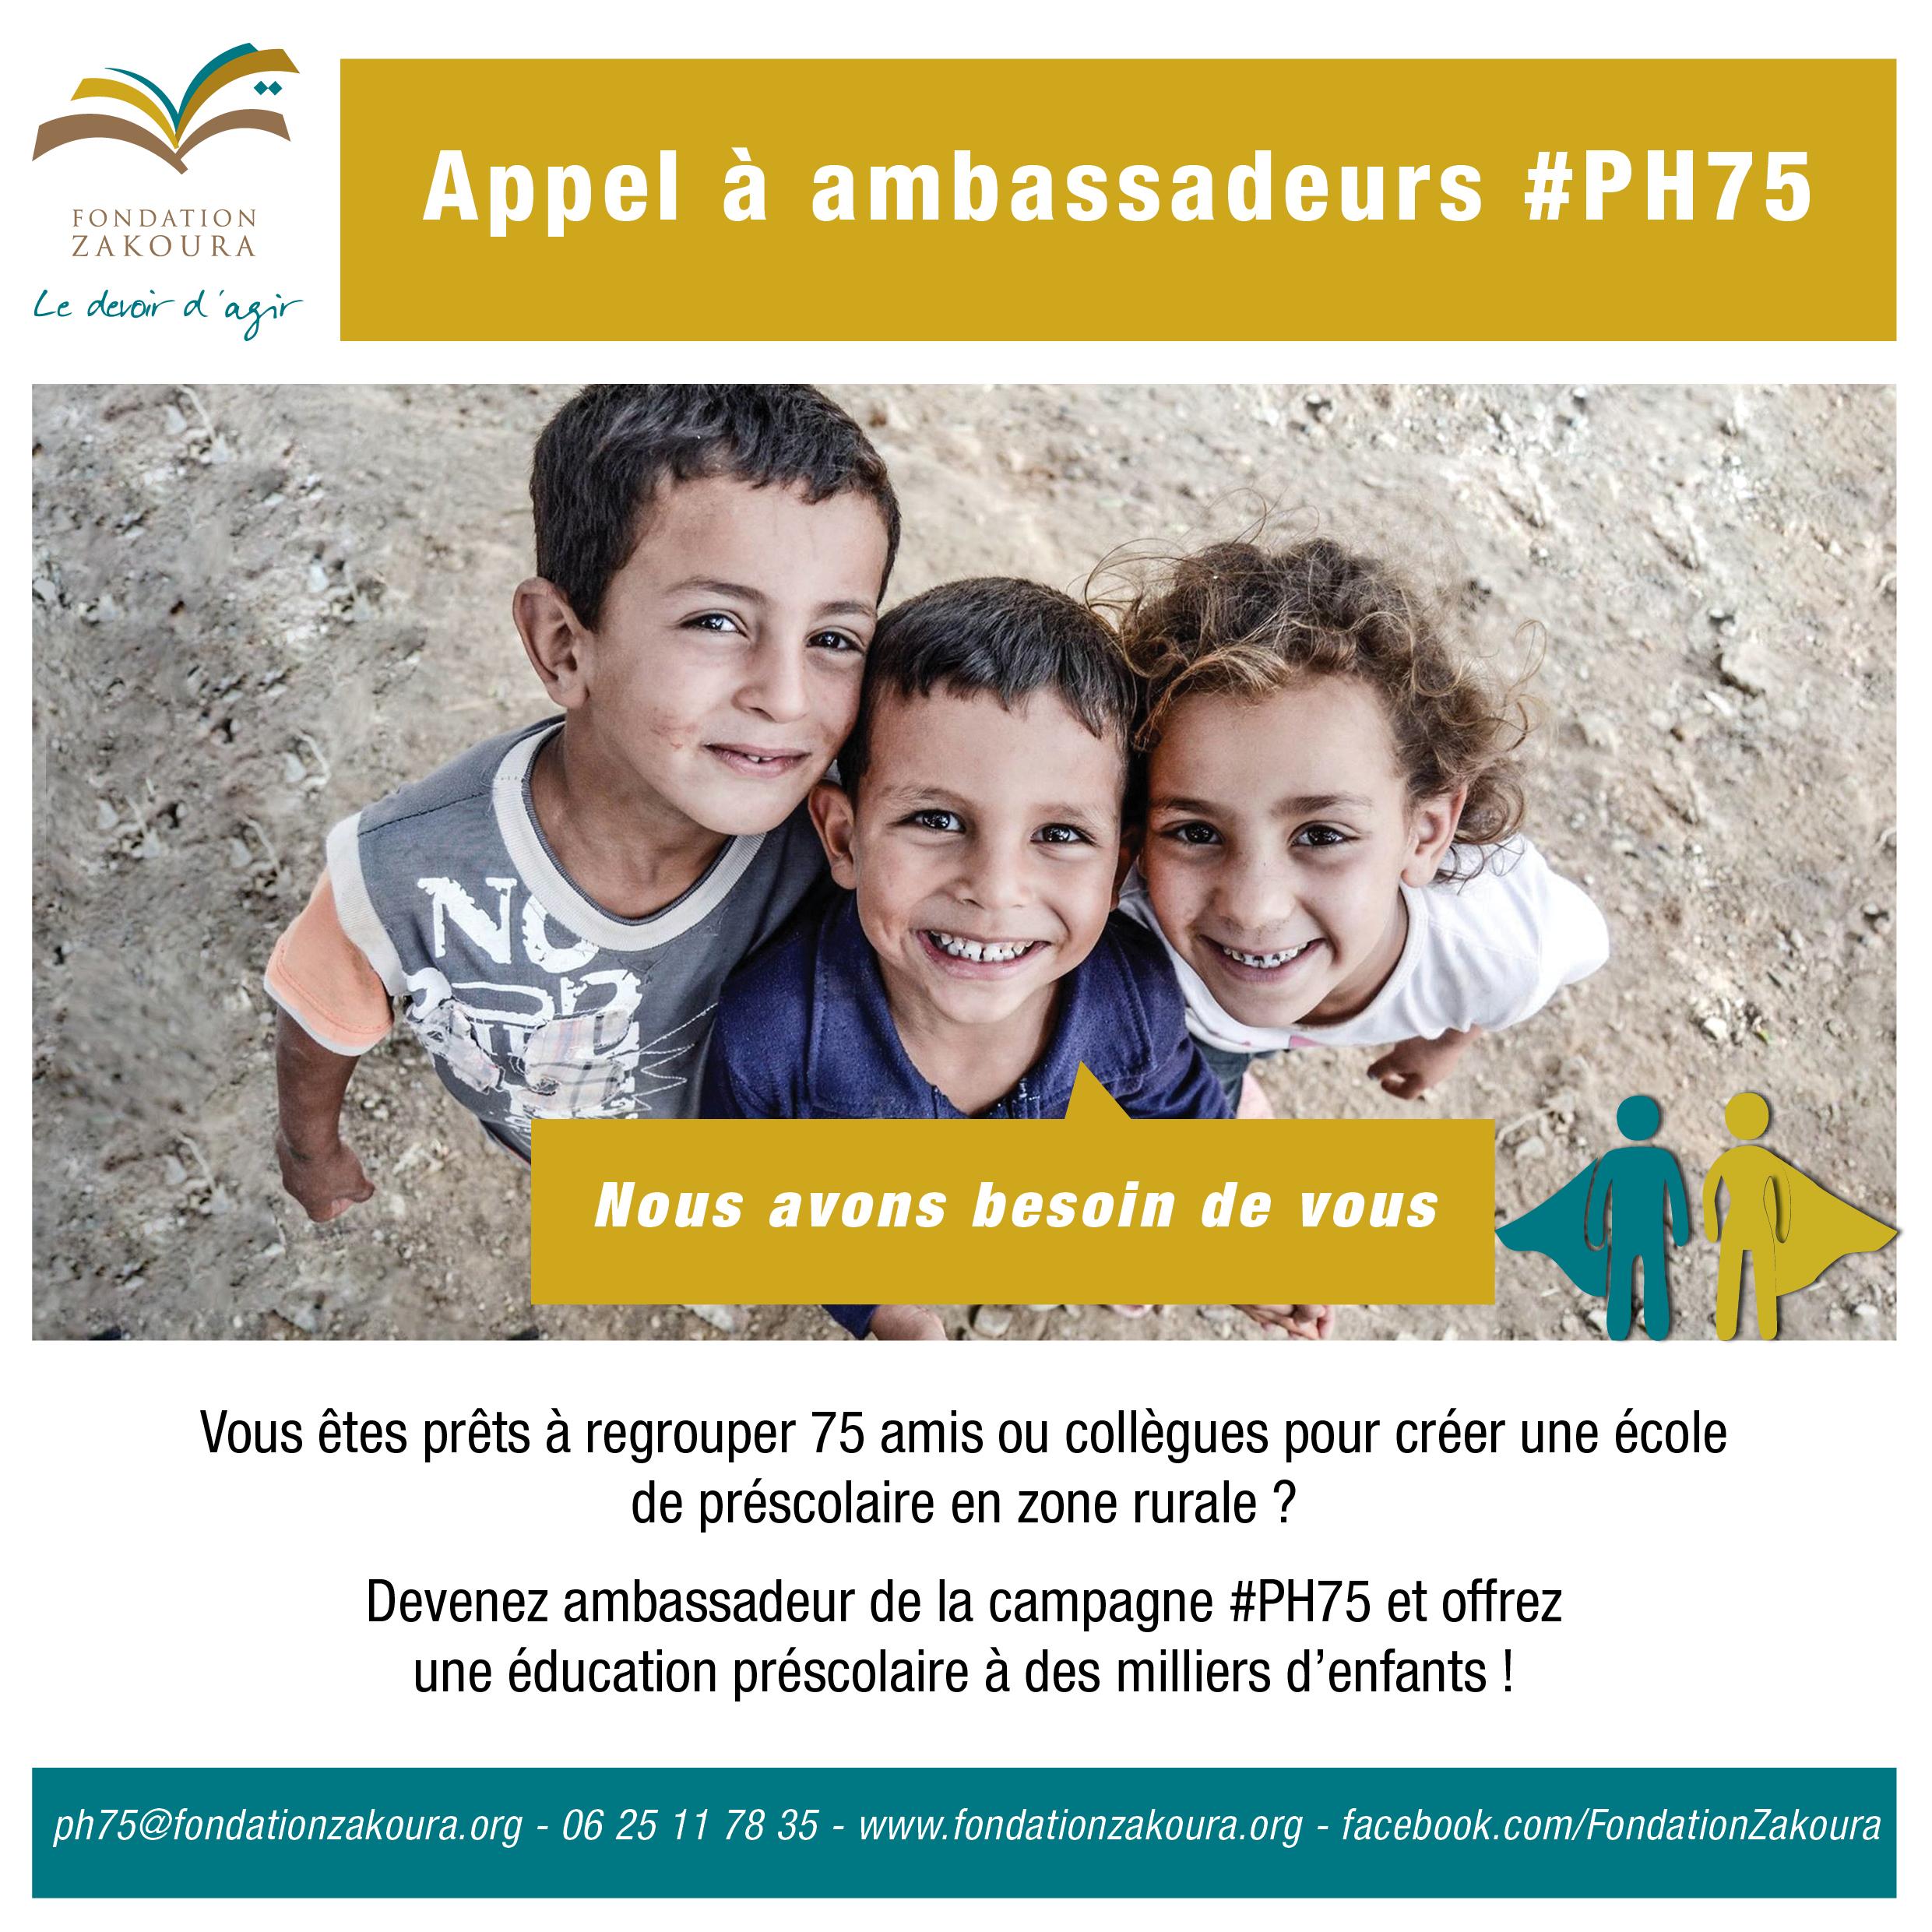 Appel à ambassadeurs #PH75 !